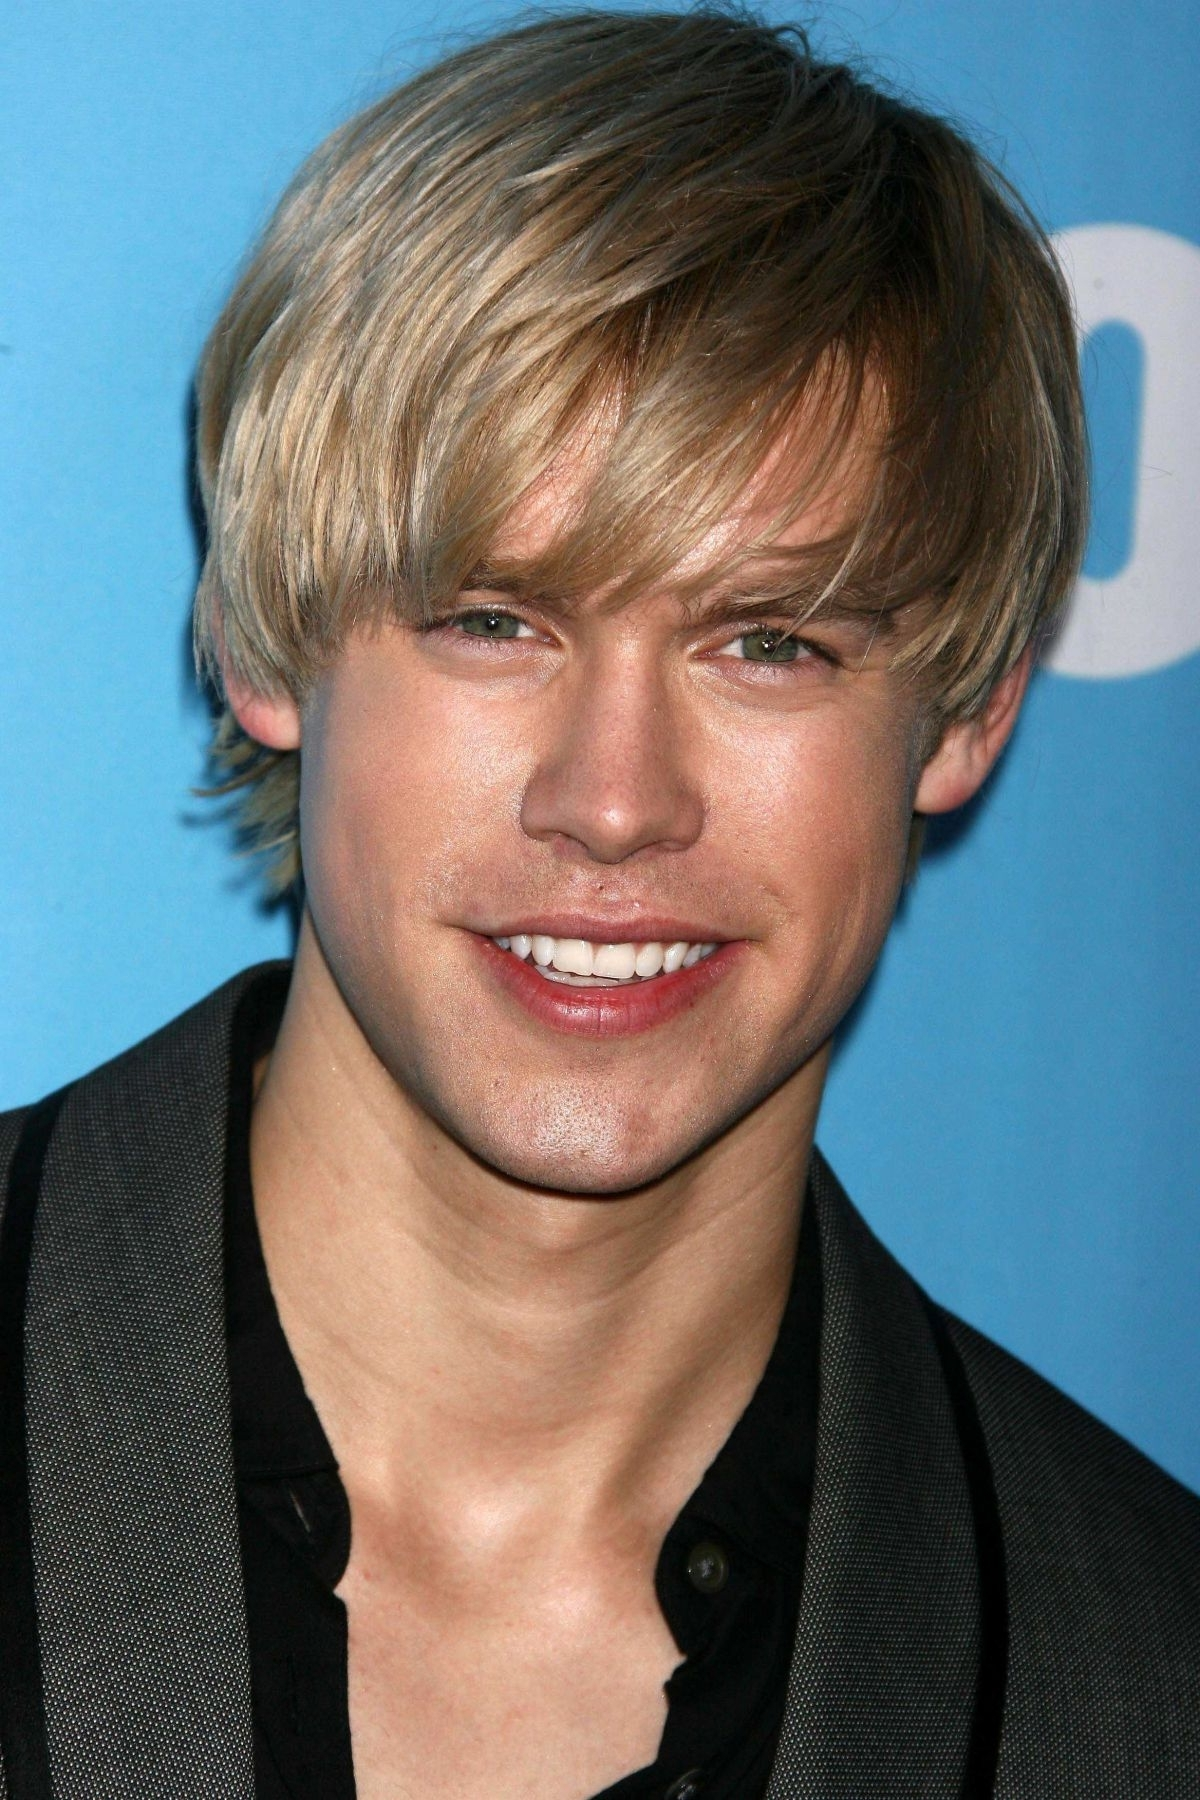 Most Recent Long Top Undercut Blonde Hairstyles For Best 30 Blonde Hairstyles For Men In (View 14 of 20)